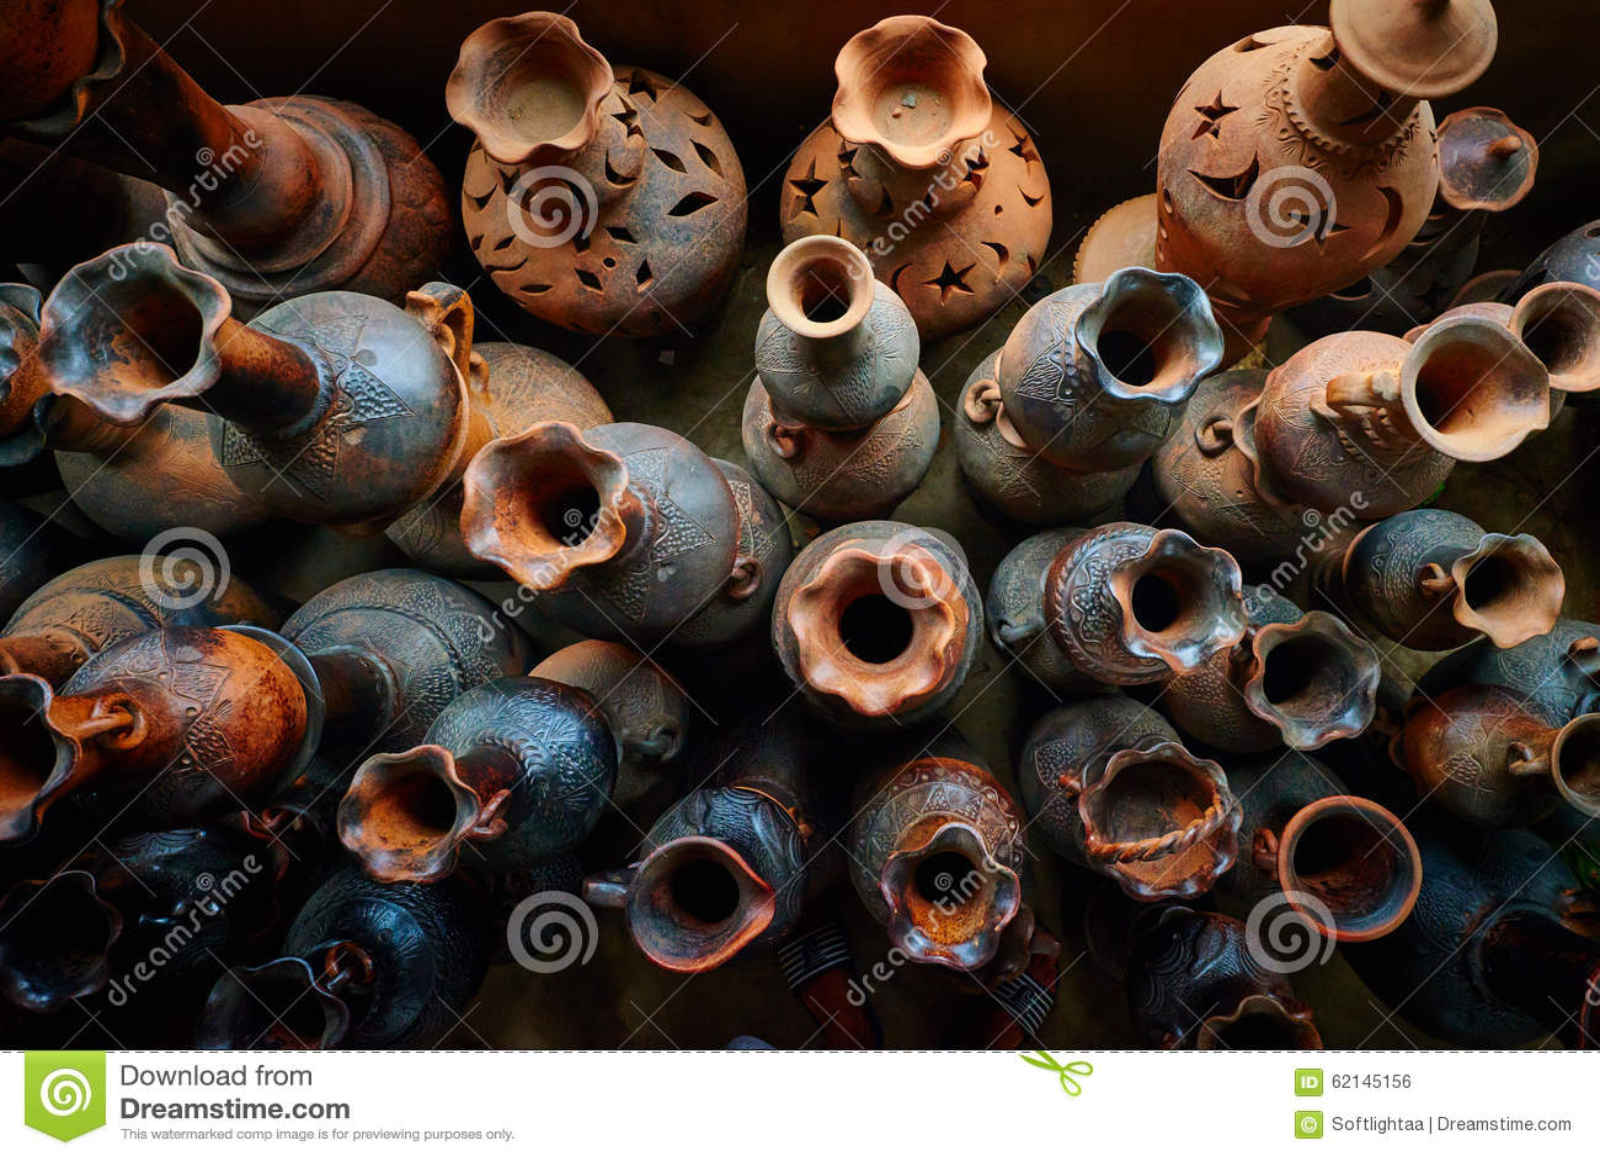 Clay Pots Traditional Handicraft In Vietnam Stock Photo Image Of